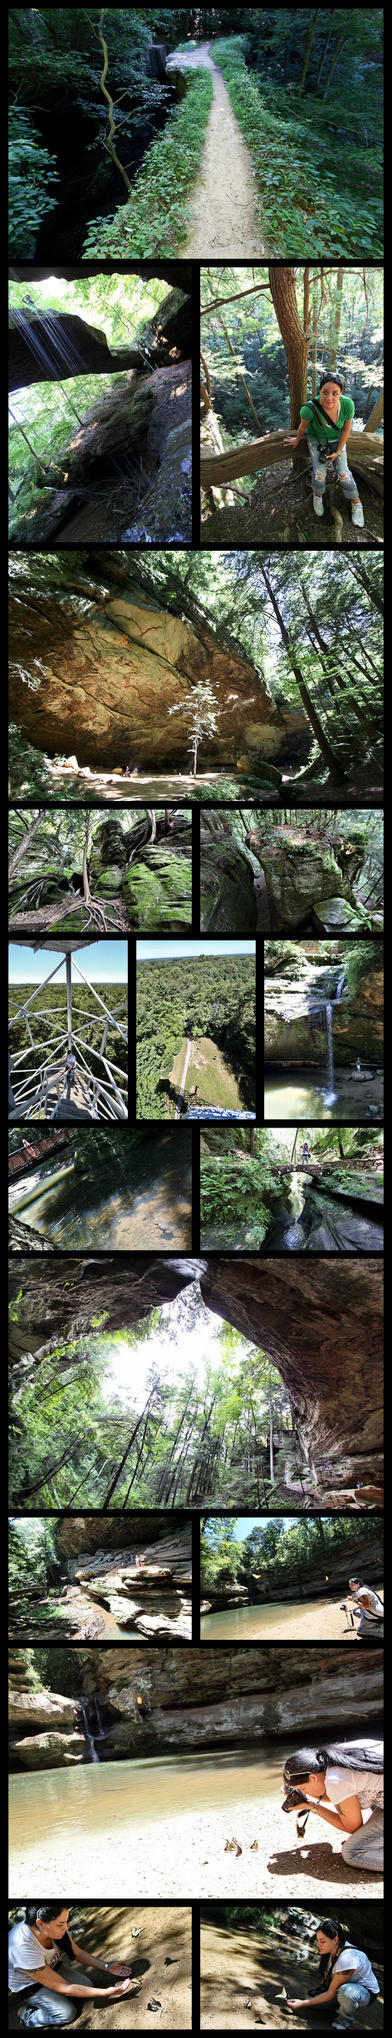 Butterflies and Waterfalls by greenie